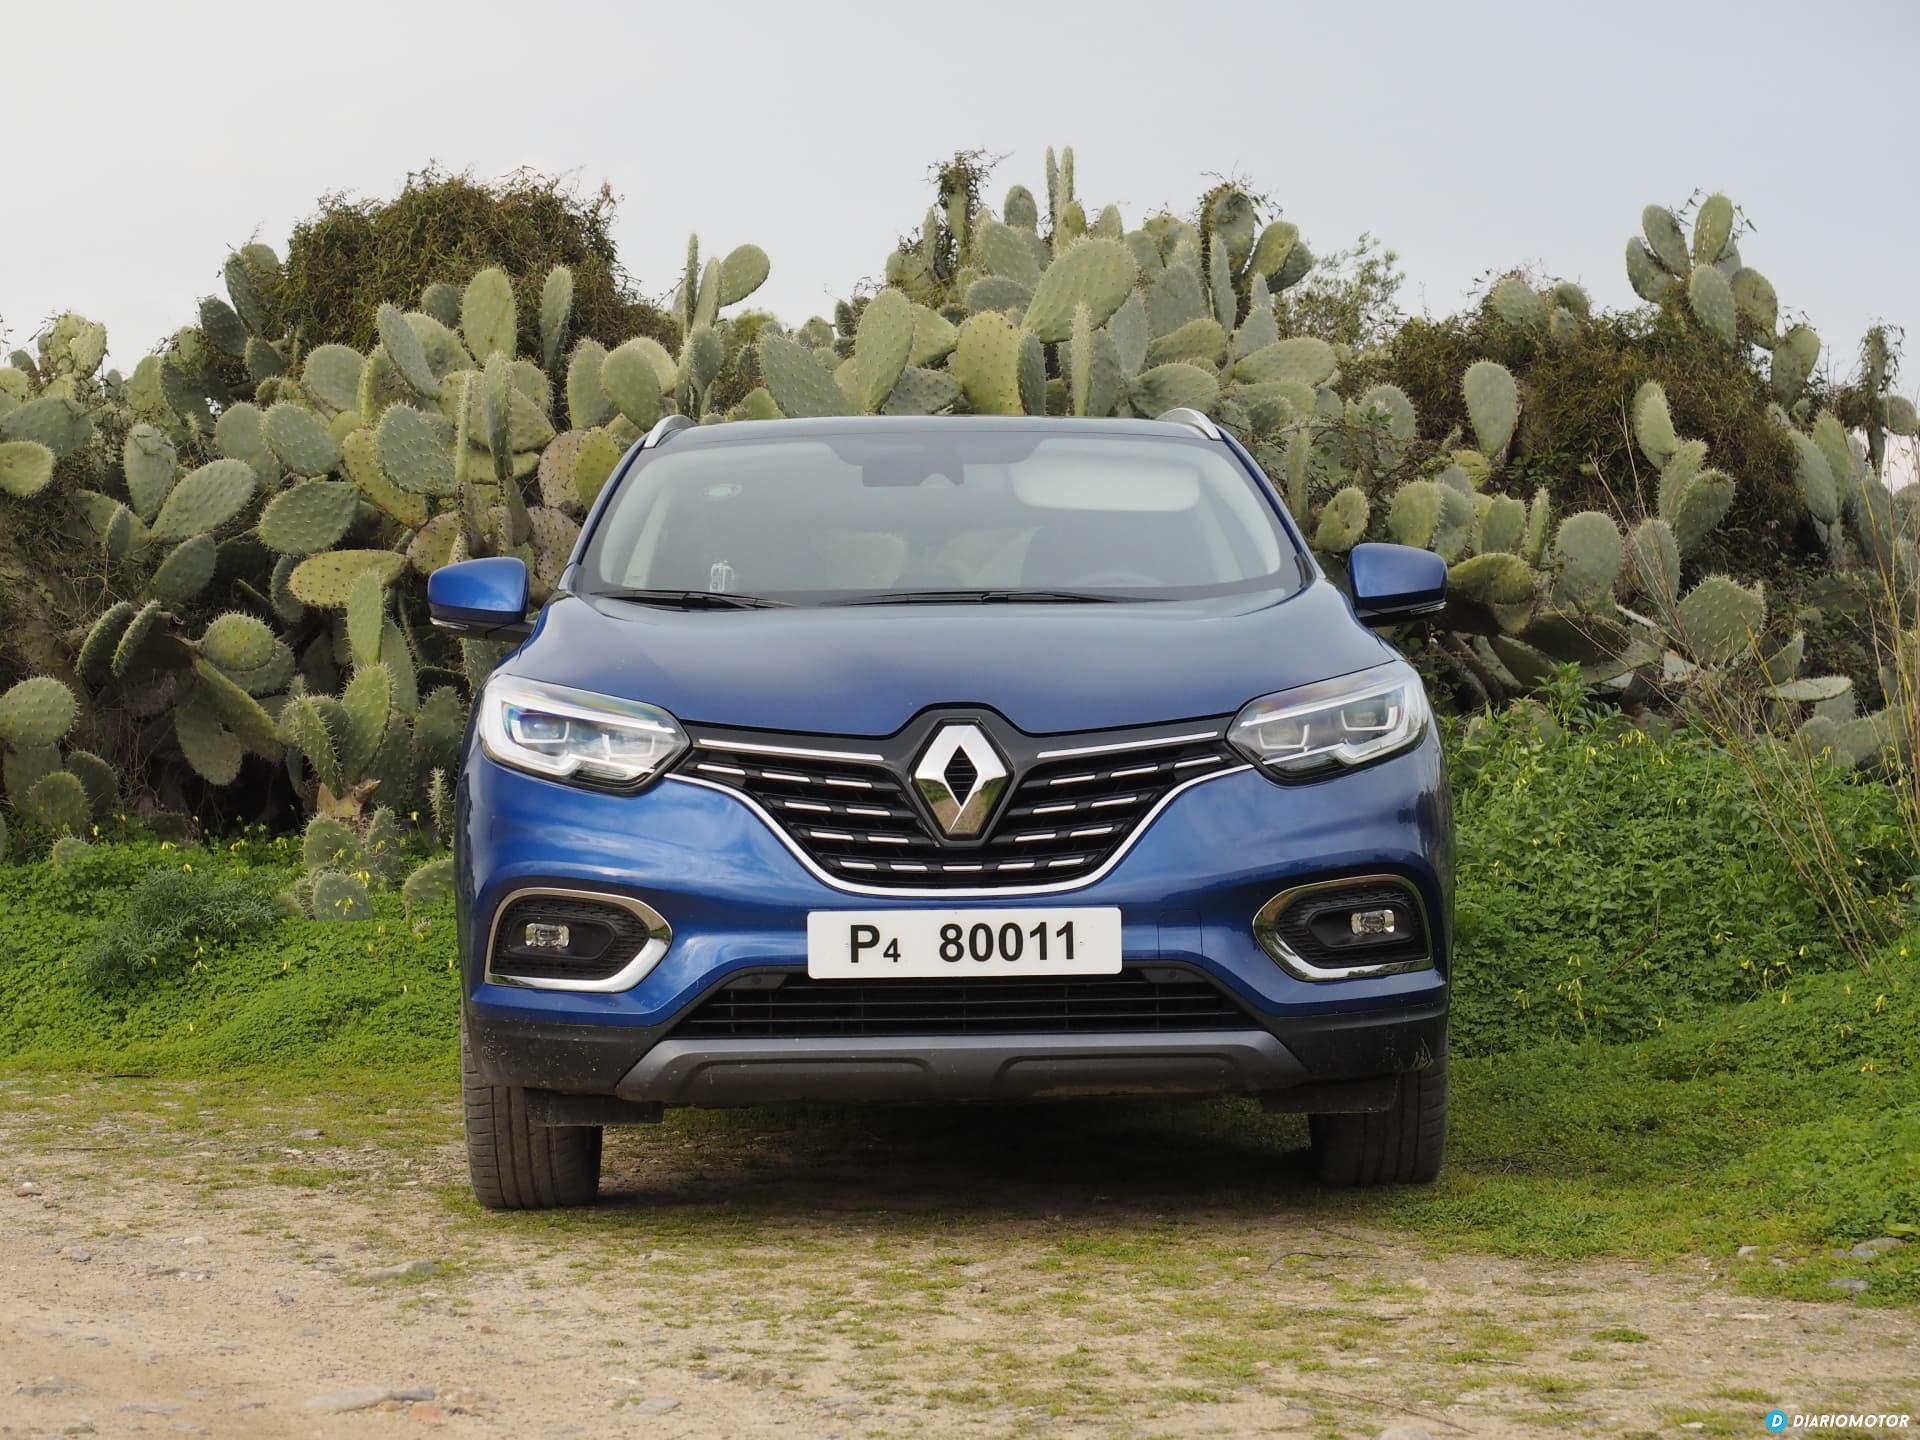 Renault Kadjar 2019 Exterior 00009